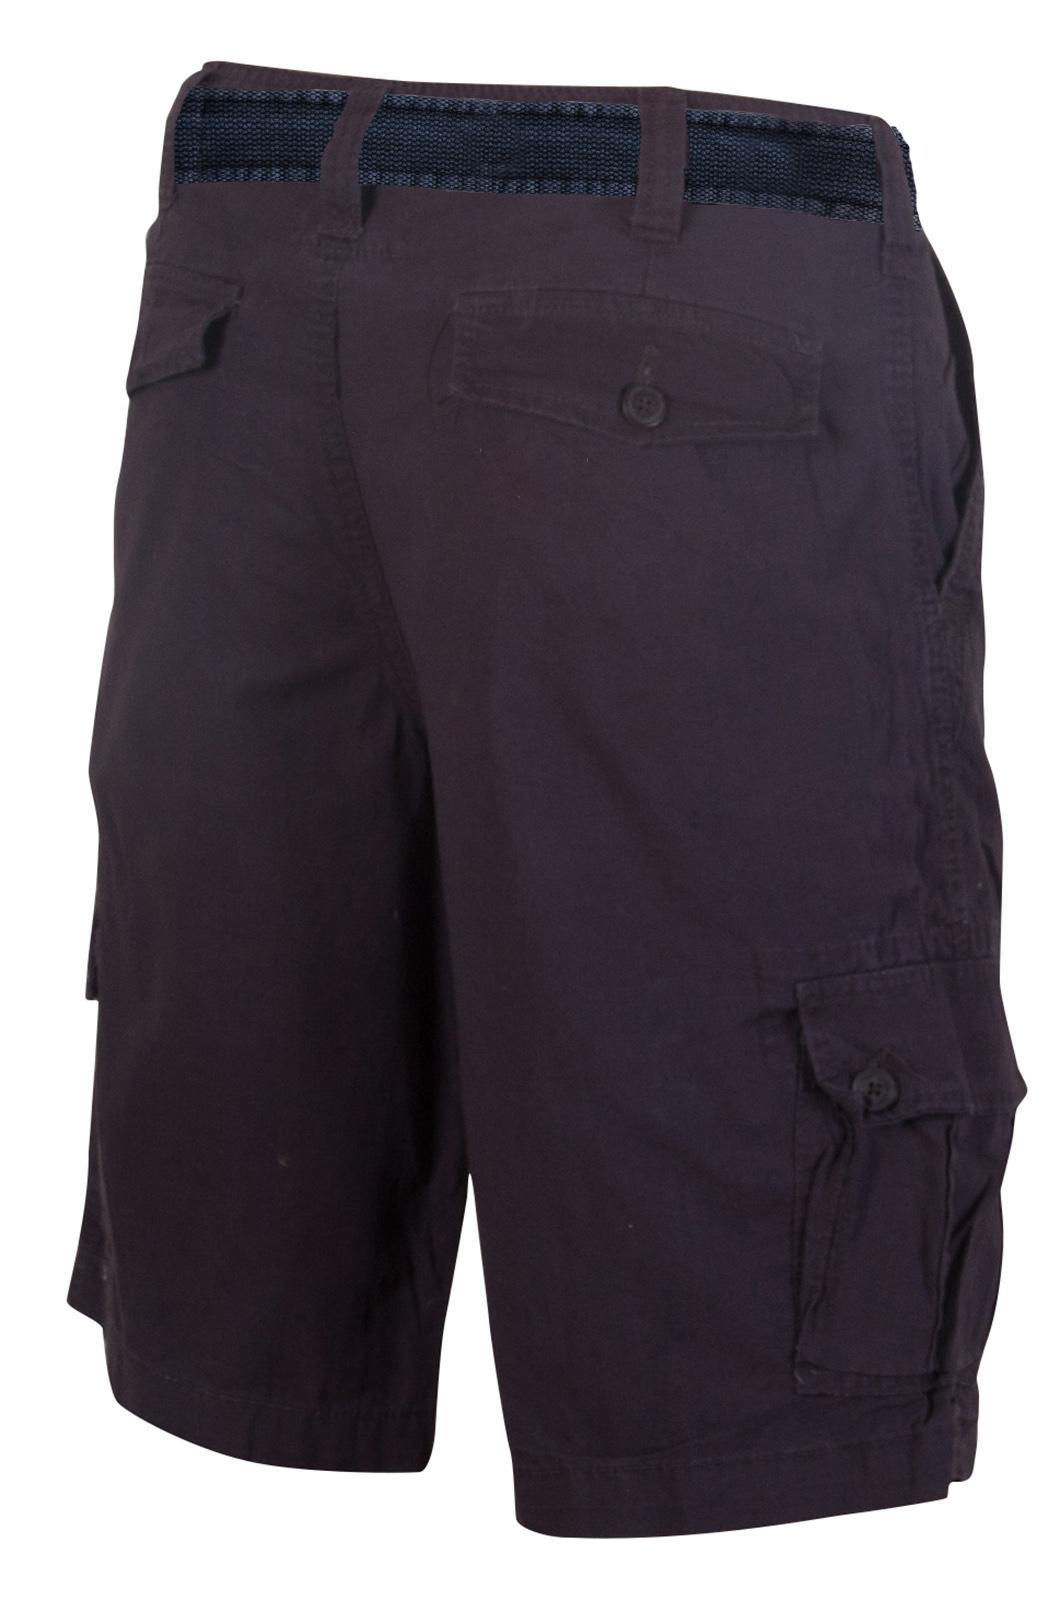 Мужские шорты Урбан - купить онлайн